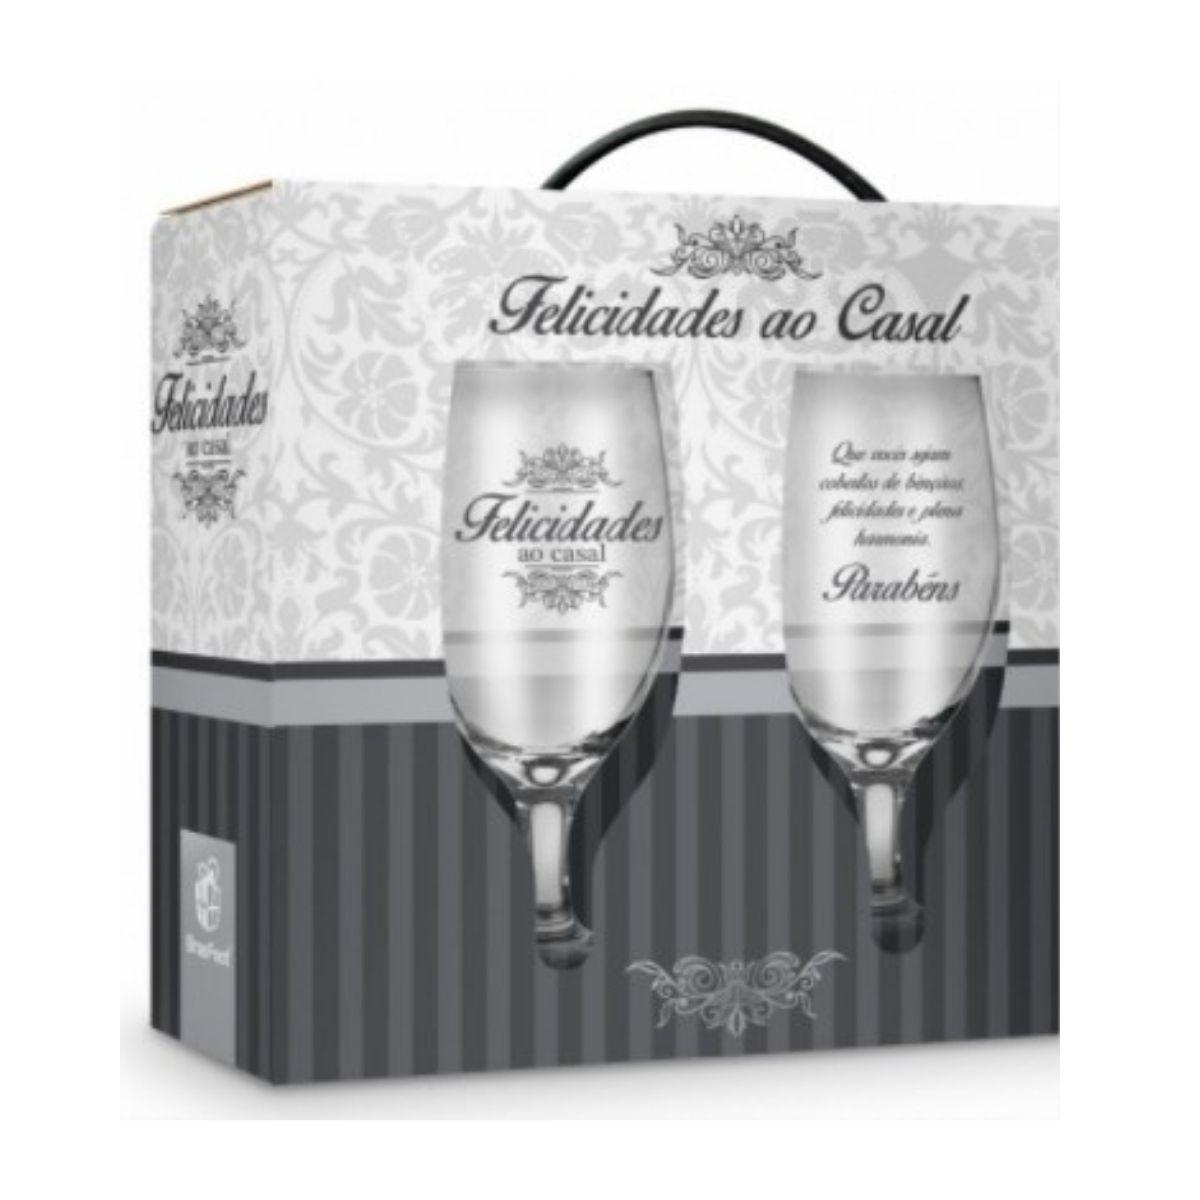 Conjunto 2 Taças Windsor Presente Felicidades ao Casal Cinza Brasfoot